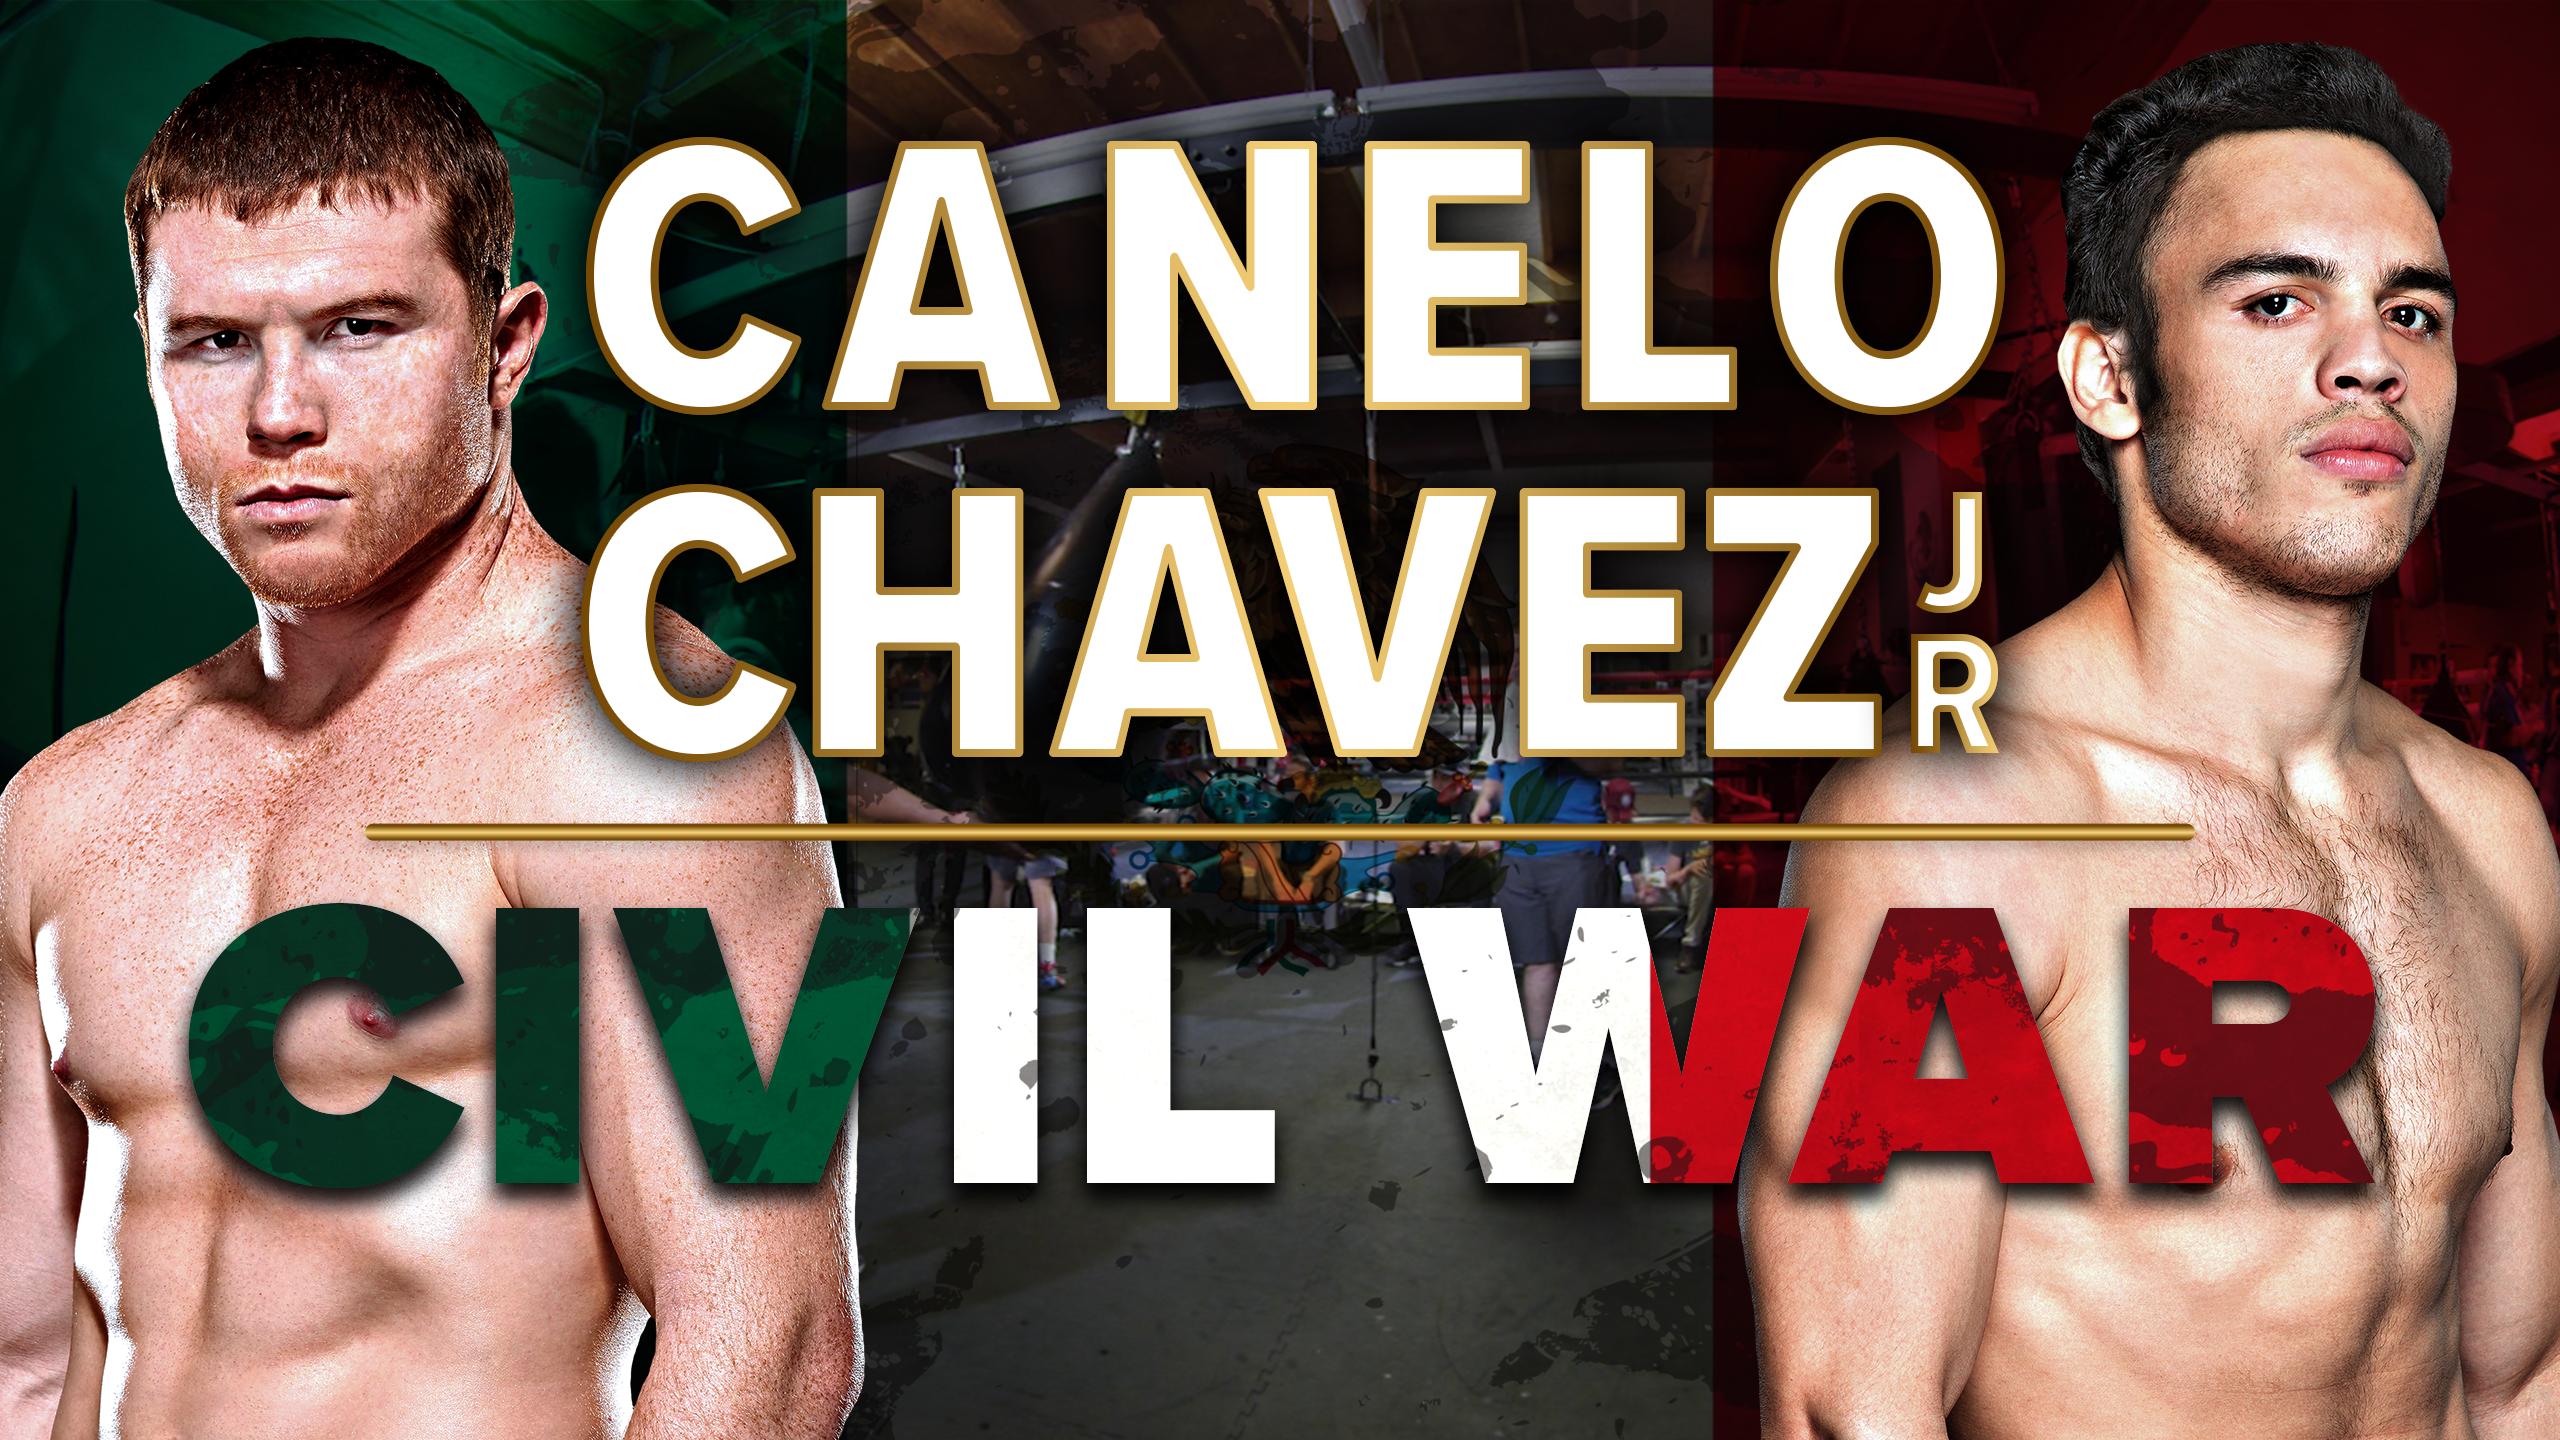 HBO_CaneloChavez_CivilWar_Thumbnail